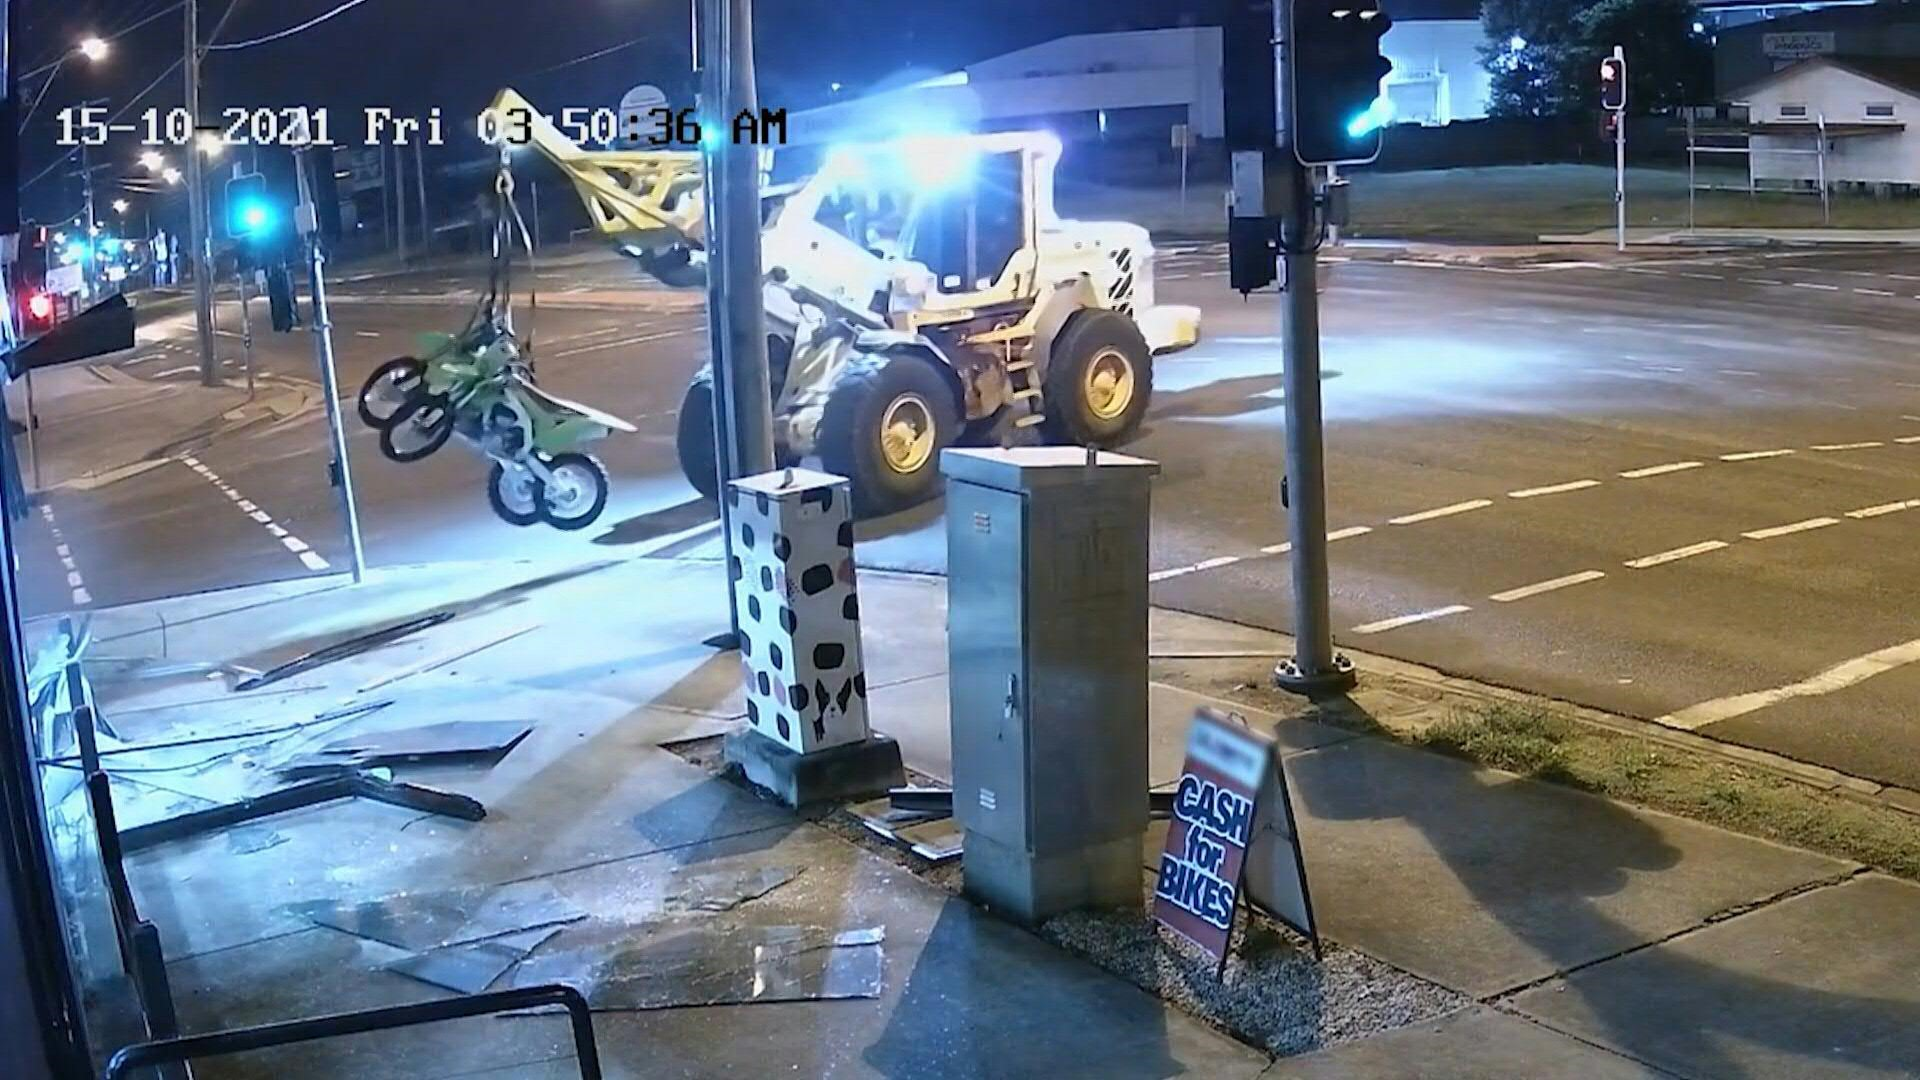 Australian police chase tractor used in daring bike shop ram raid